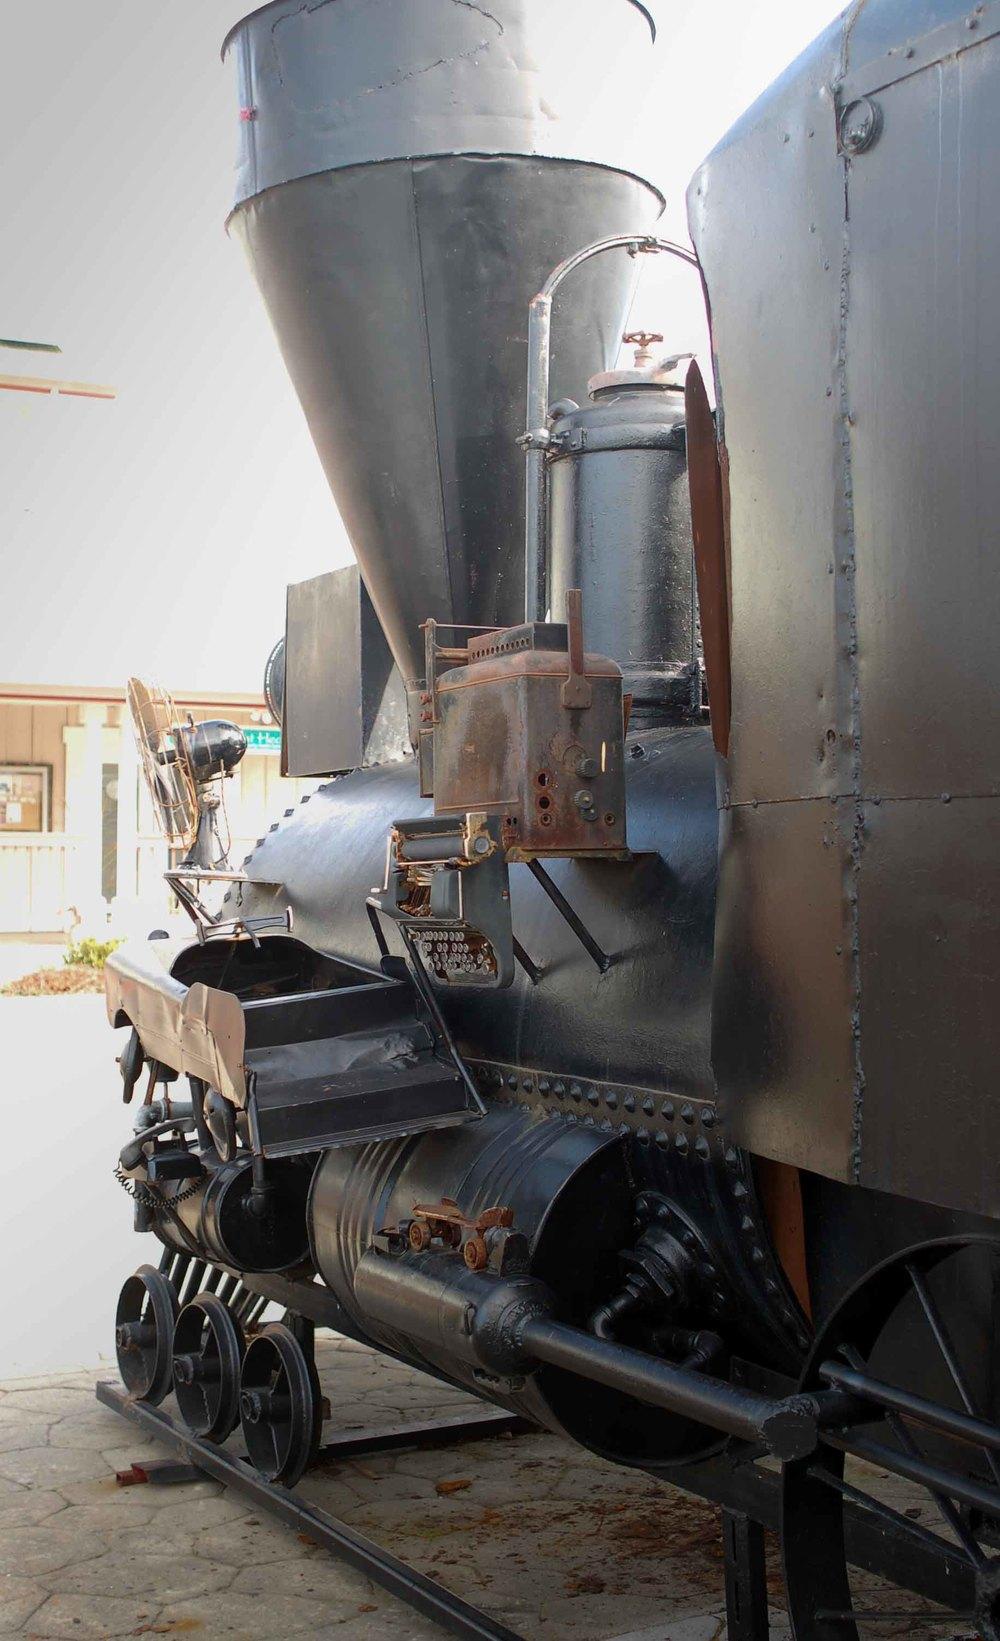 Sebastopol artist Patrick Amiot's Great Locomotive sculpture.